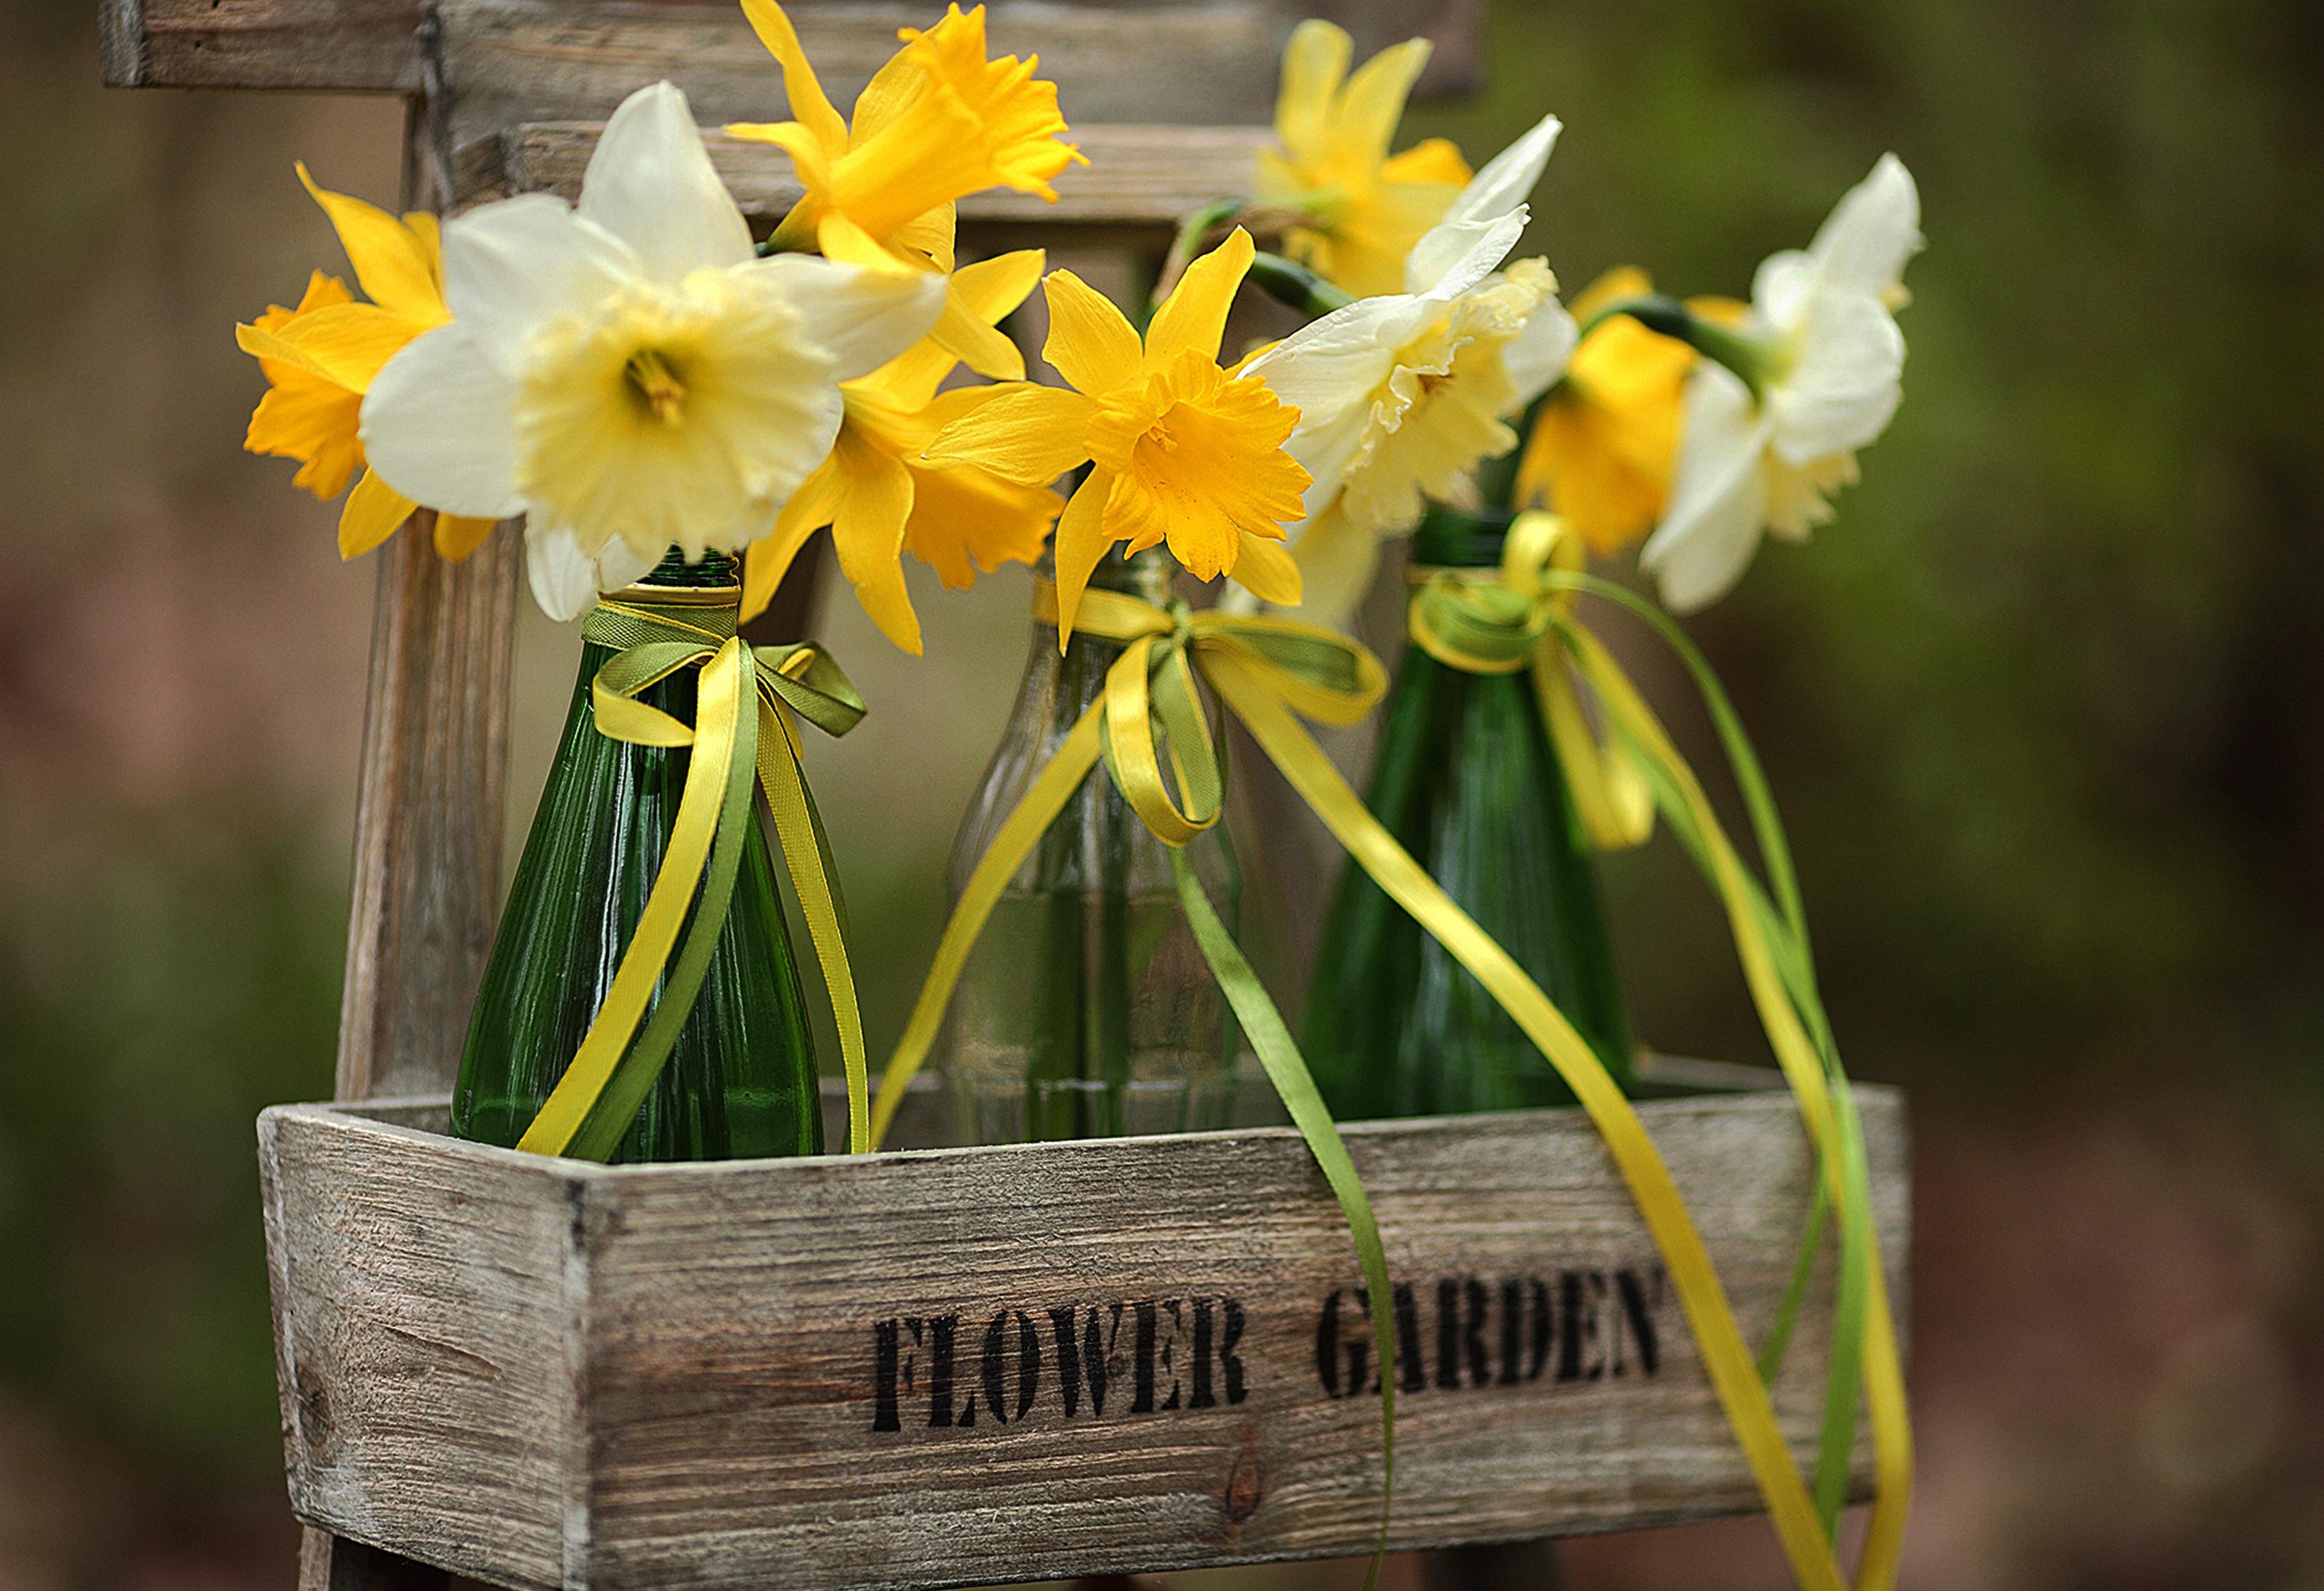 daffodils-photo-32